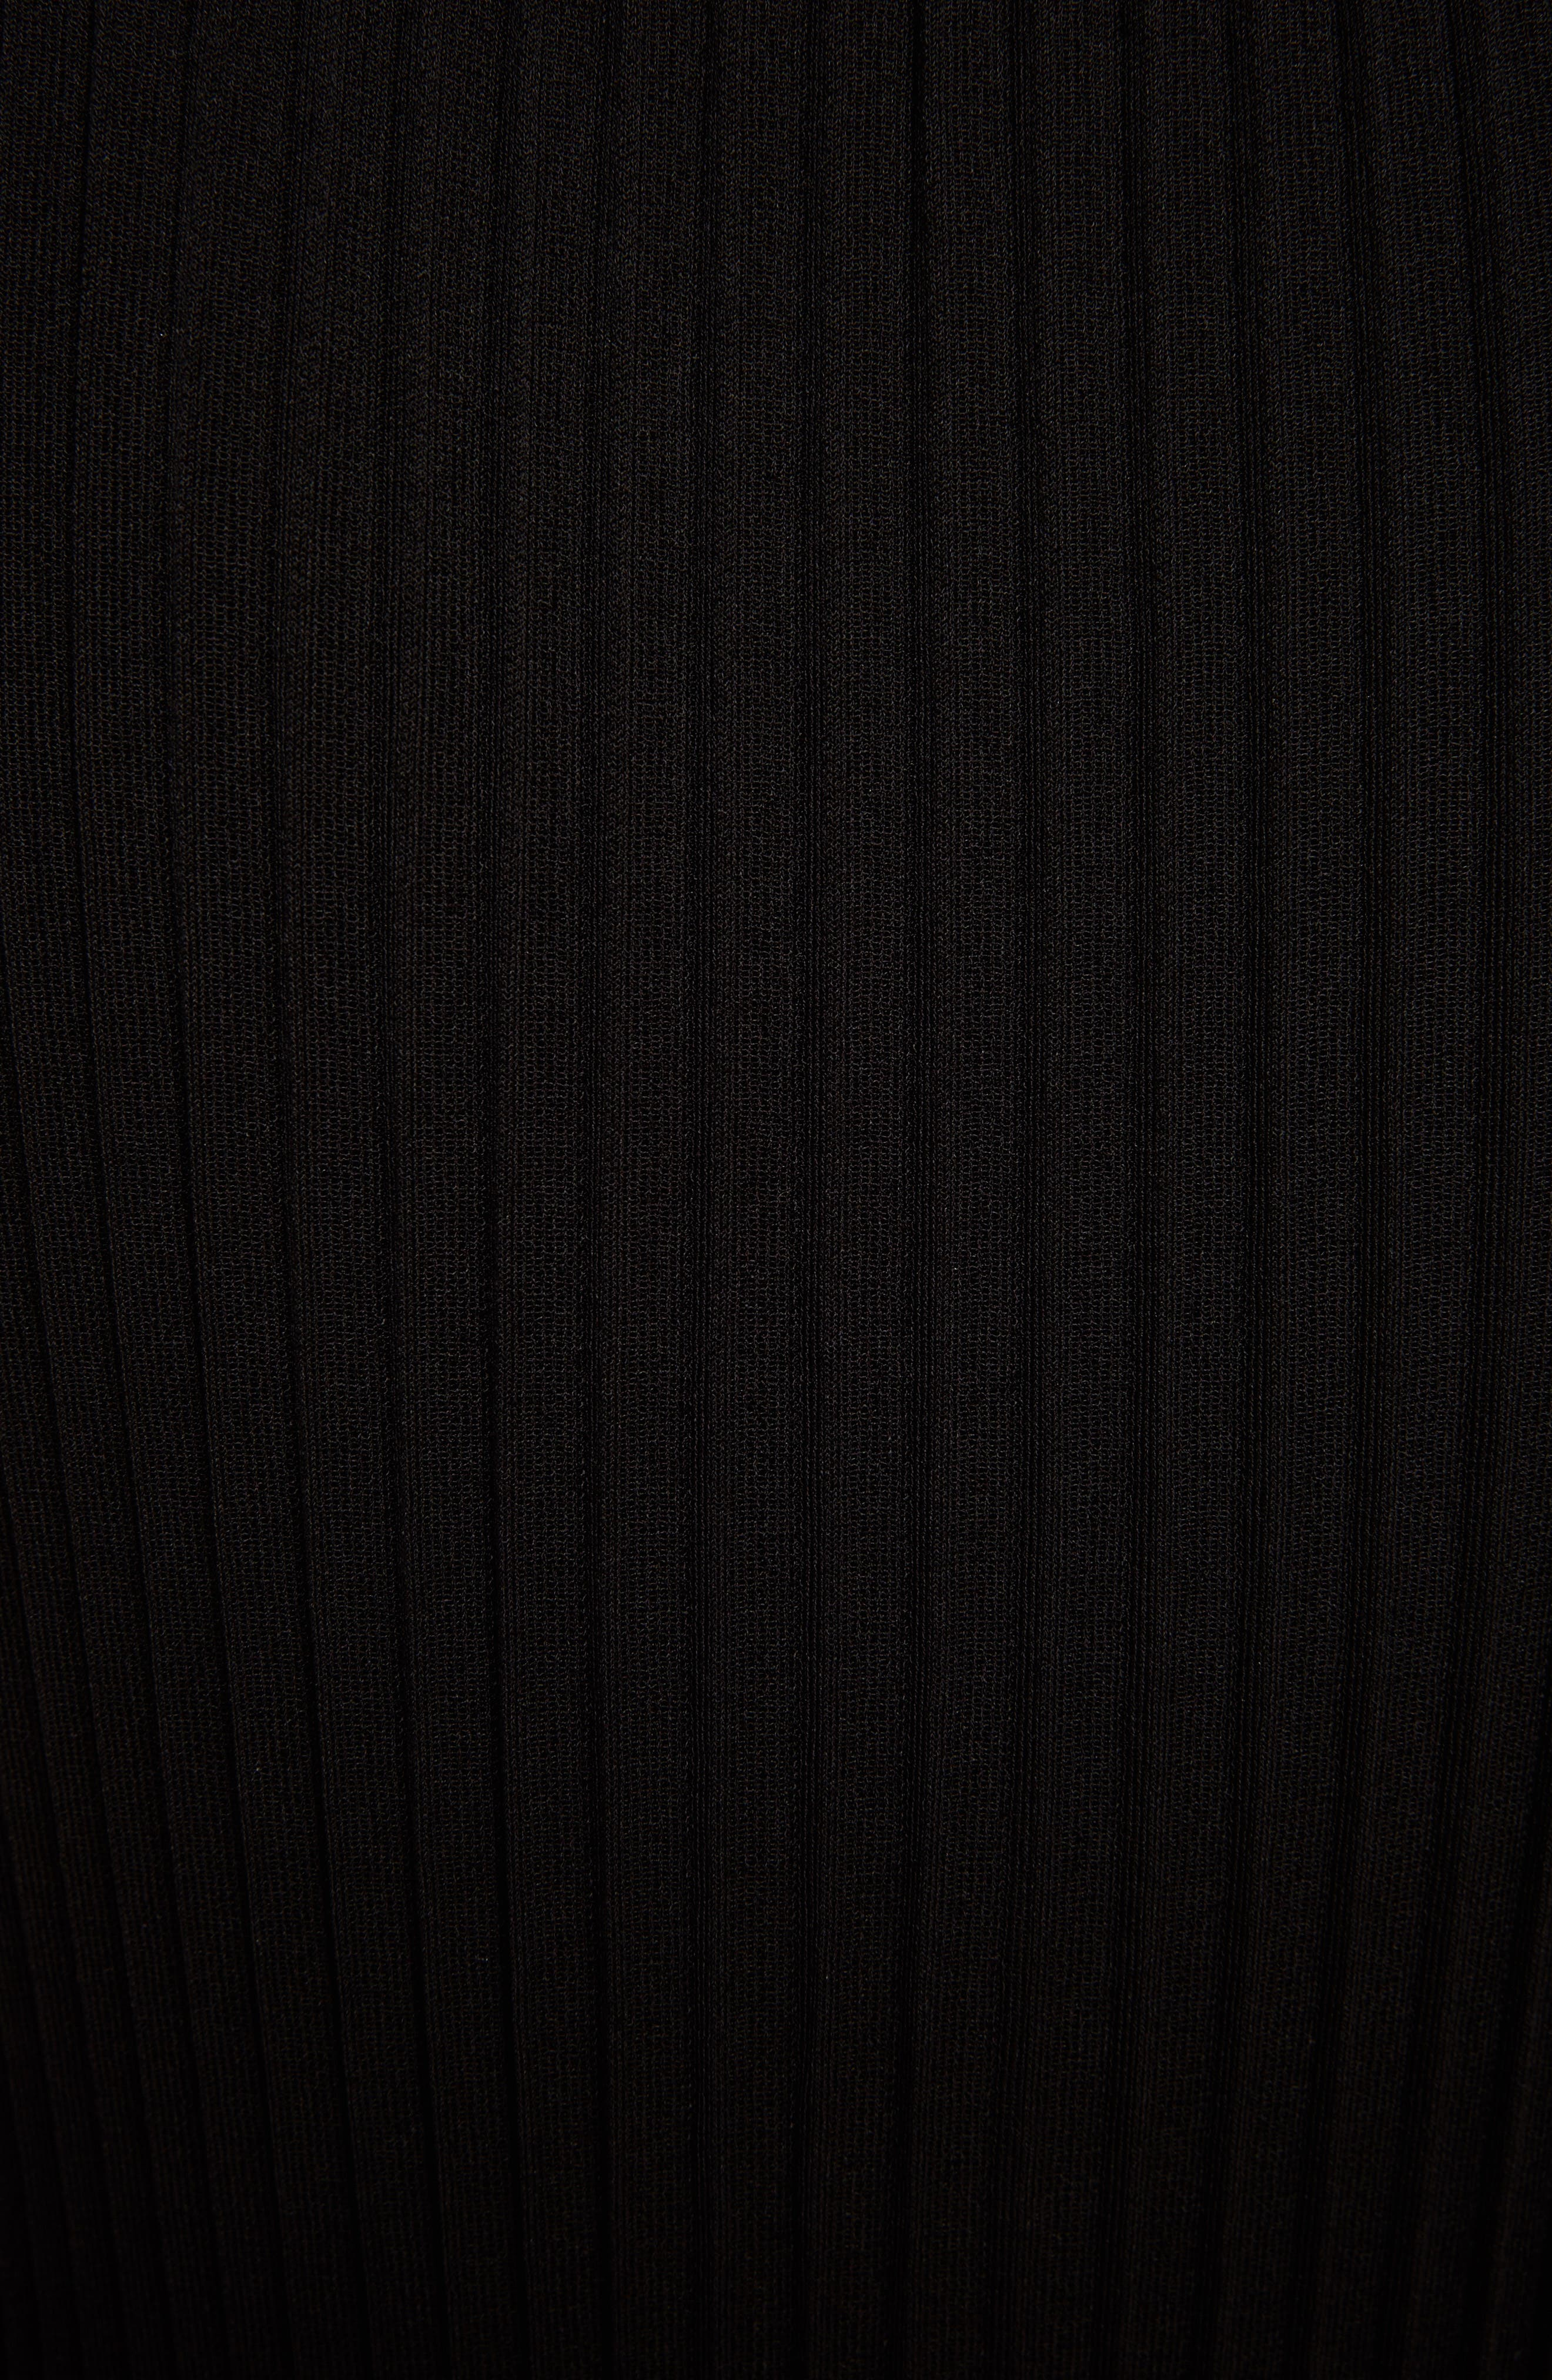 Ribbed Ruffle Hem Dress,                             Alternate thumbnail 5, color,                             Black